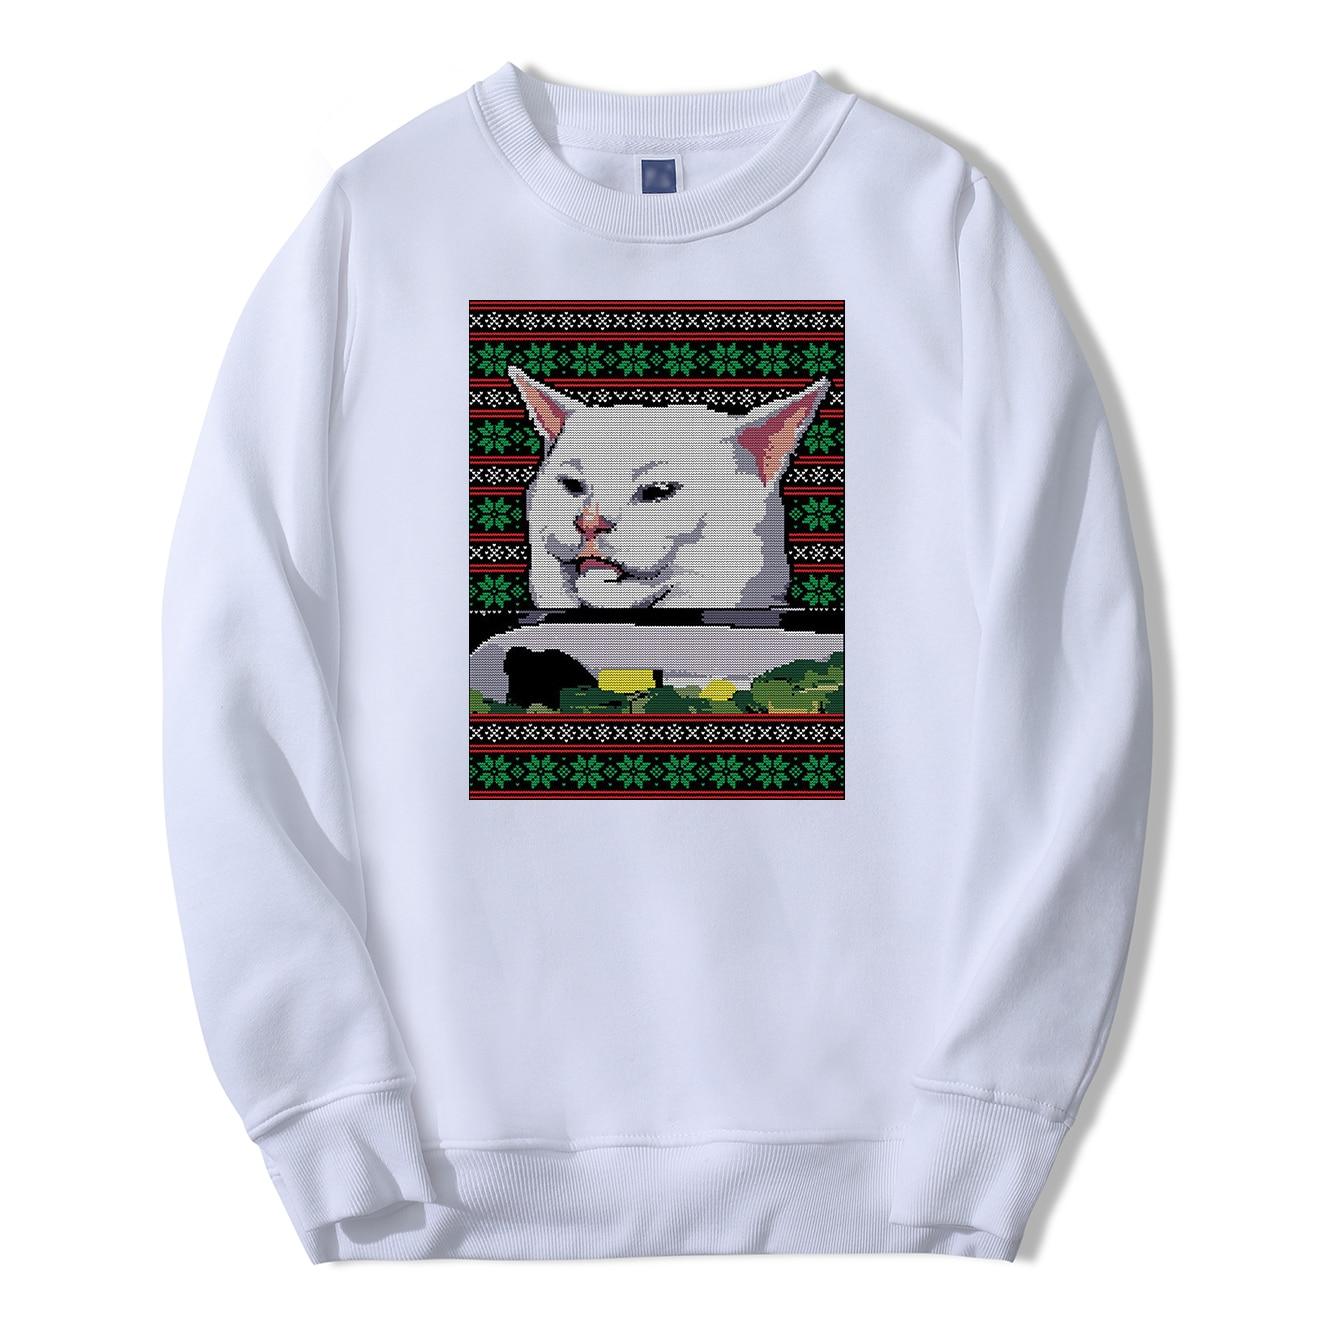 Animal Cat Funny Sweatshirt Hoodies Men Hip Hop Pullover Fleece Streetwear Crewneck Casual Sweatshirts Fashion Winter Sportswear